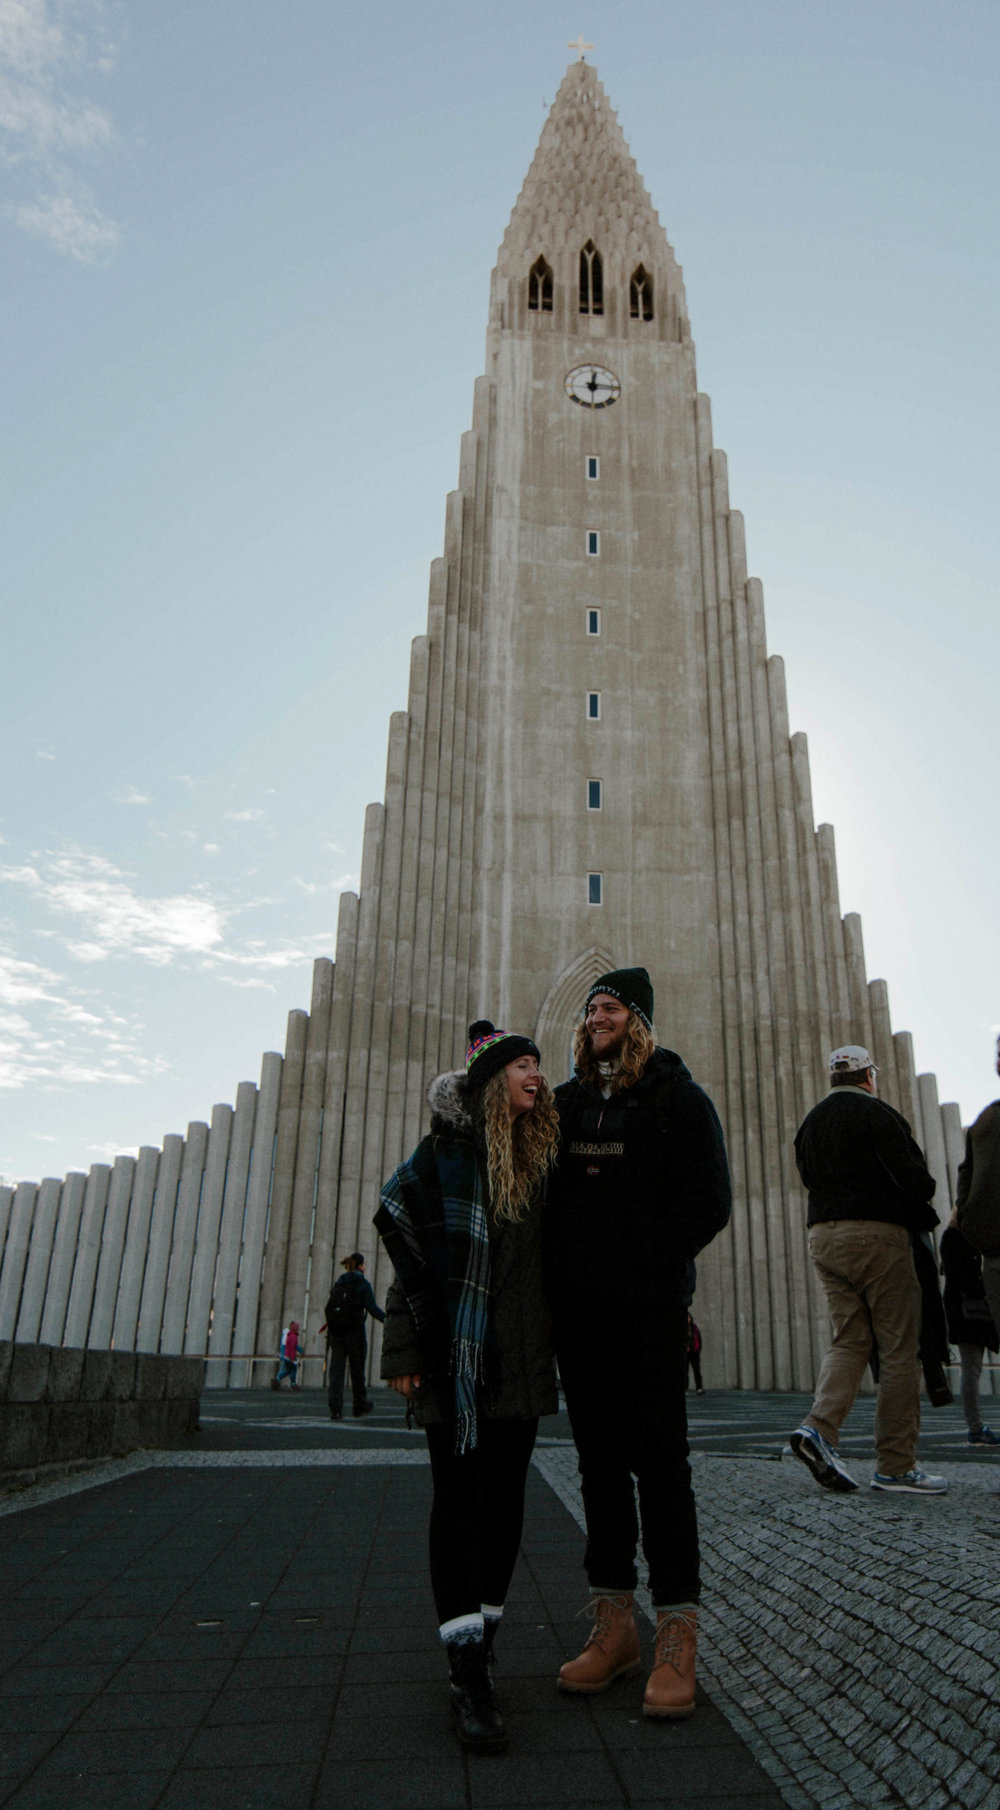 Iceland Reykjavik-28Iceland Reykjavik Grain.jpg